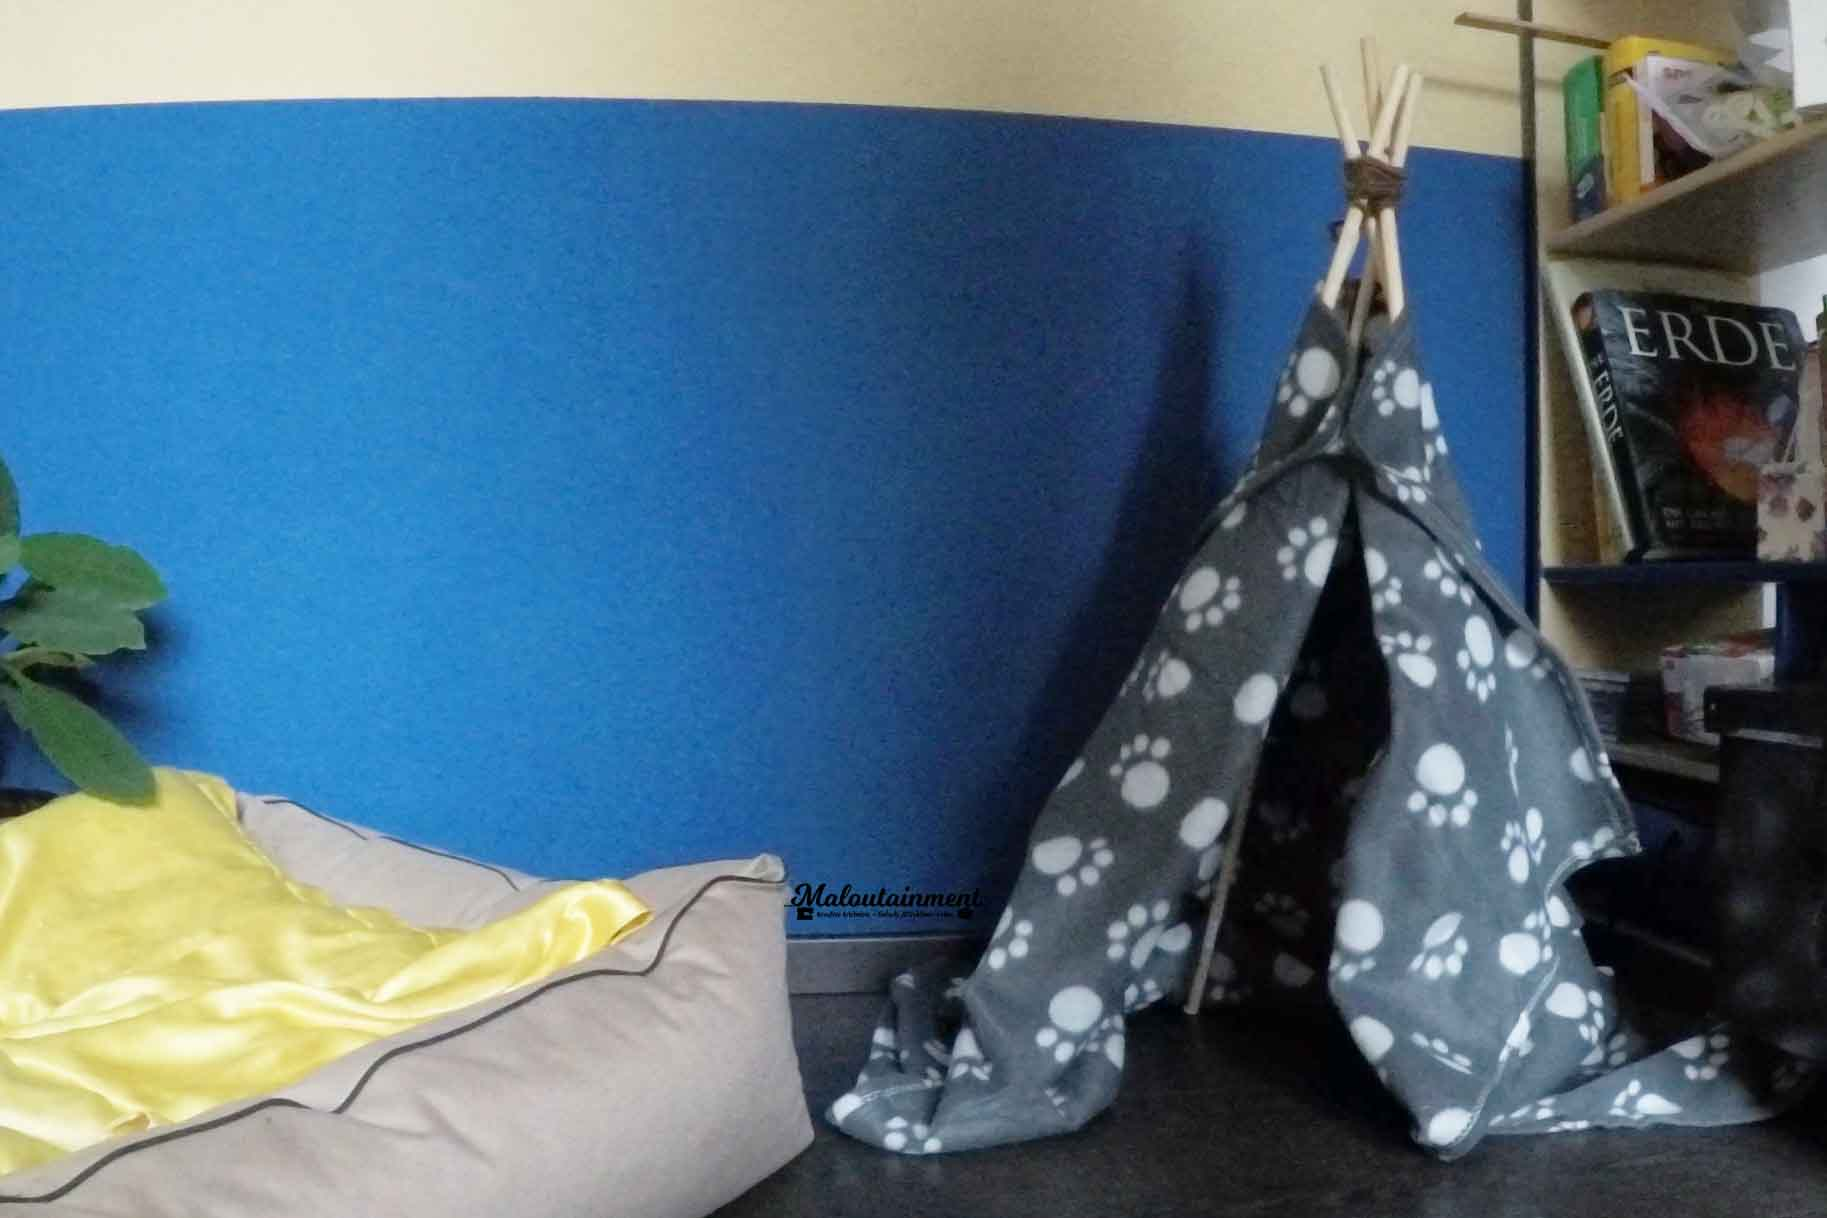 Maloutainment Fotografie DIY Do it yourself Kreativ Basteln Tier Hunde Katzen Wohnen Einrichten Moebelstueck Tippi Hoehle Blog Tipi